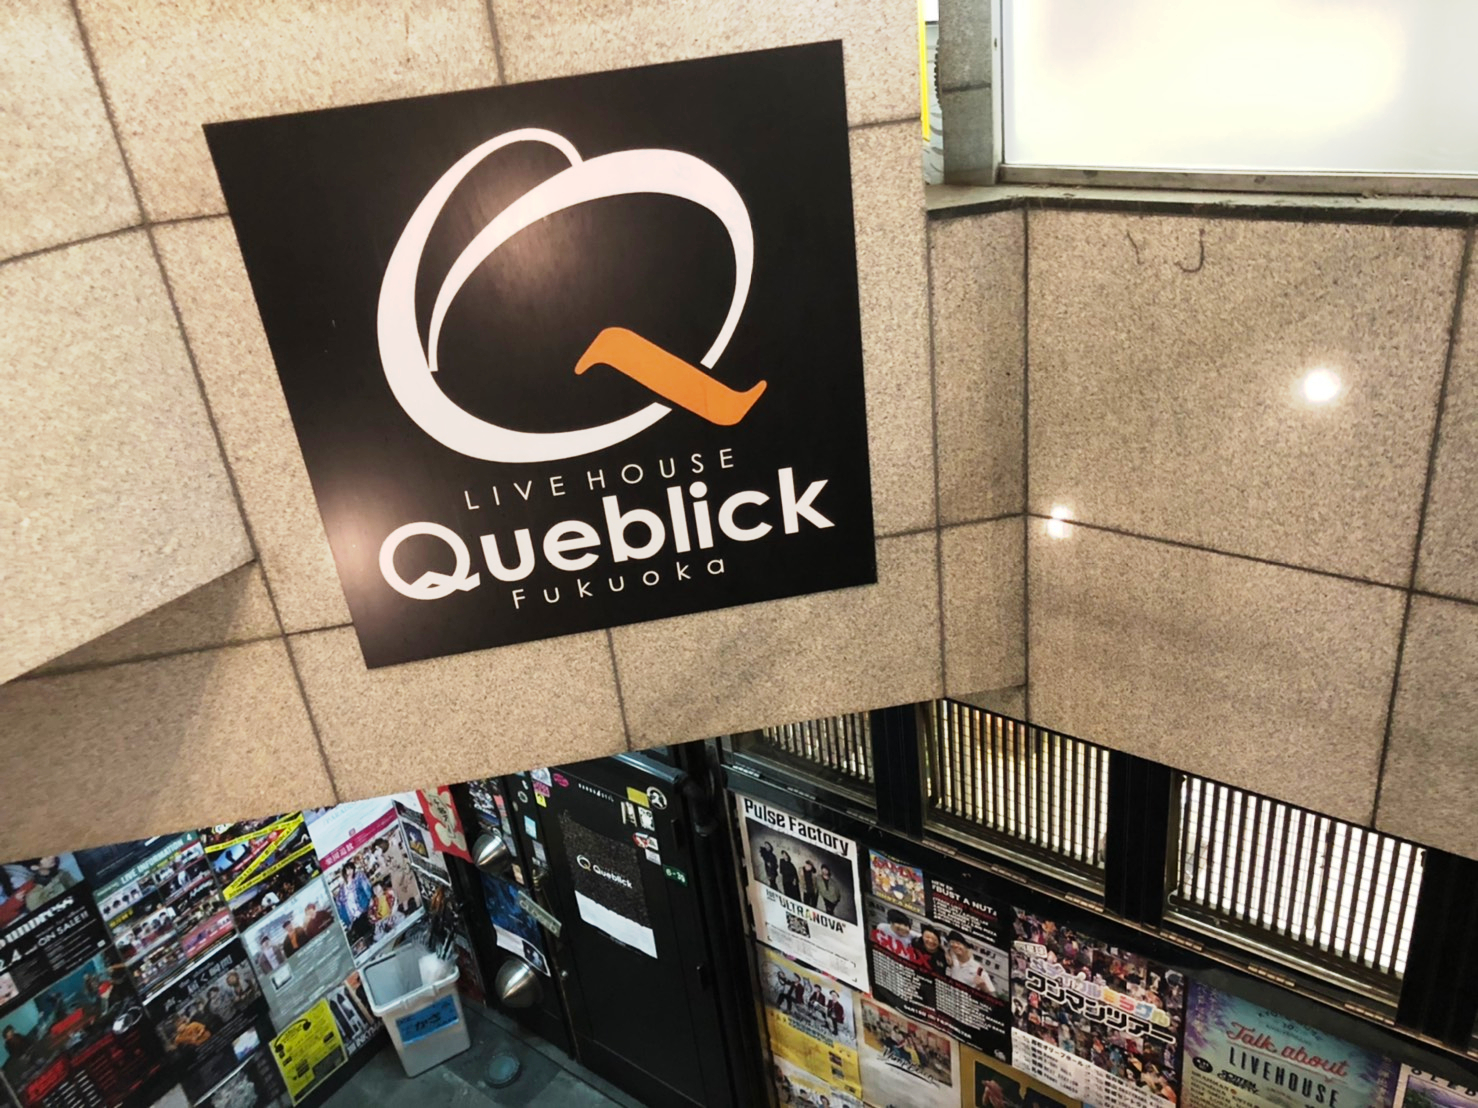 LIVE HOUSE Queblick(福岡県)